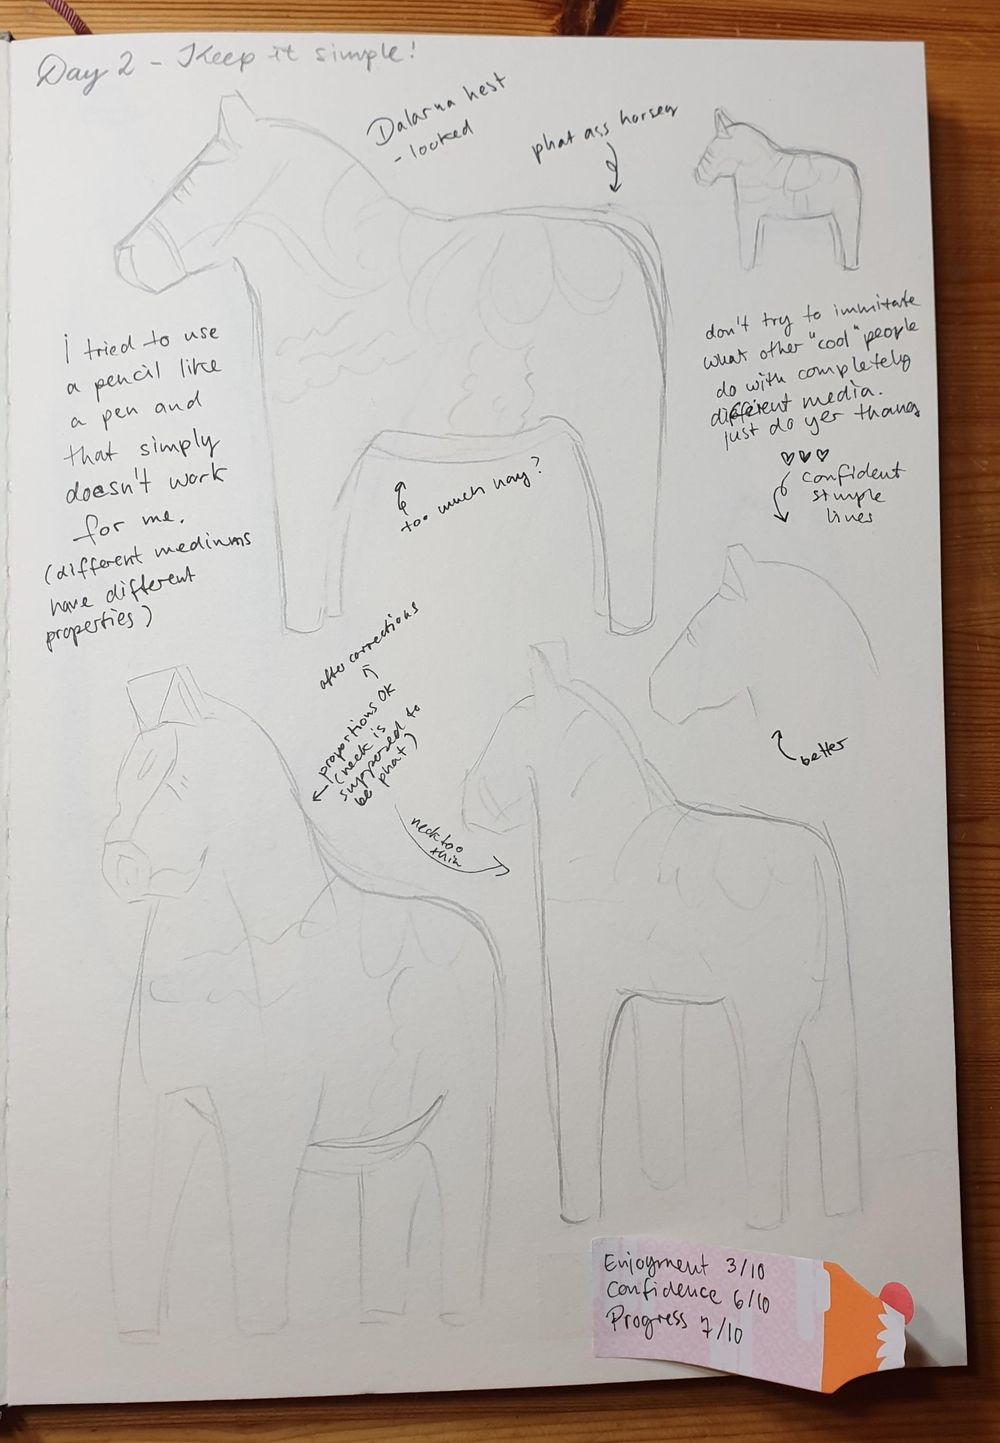 I'll be joyning - image 6 - student project